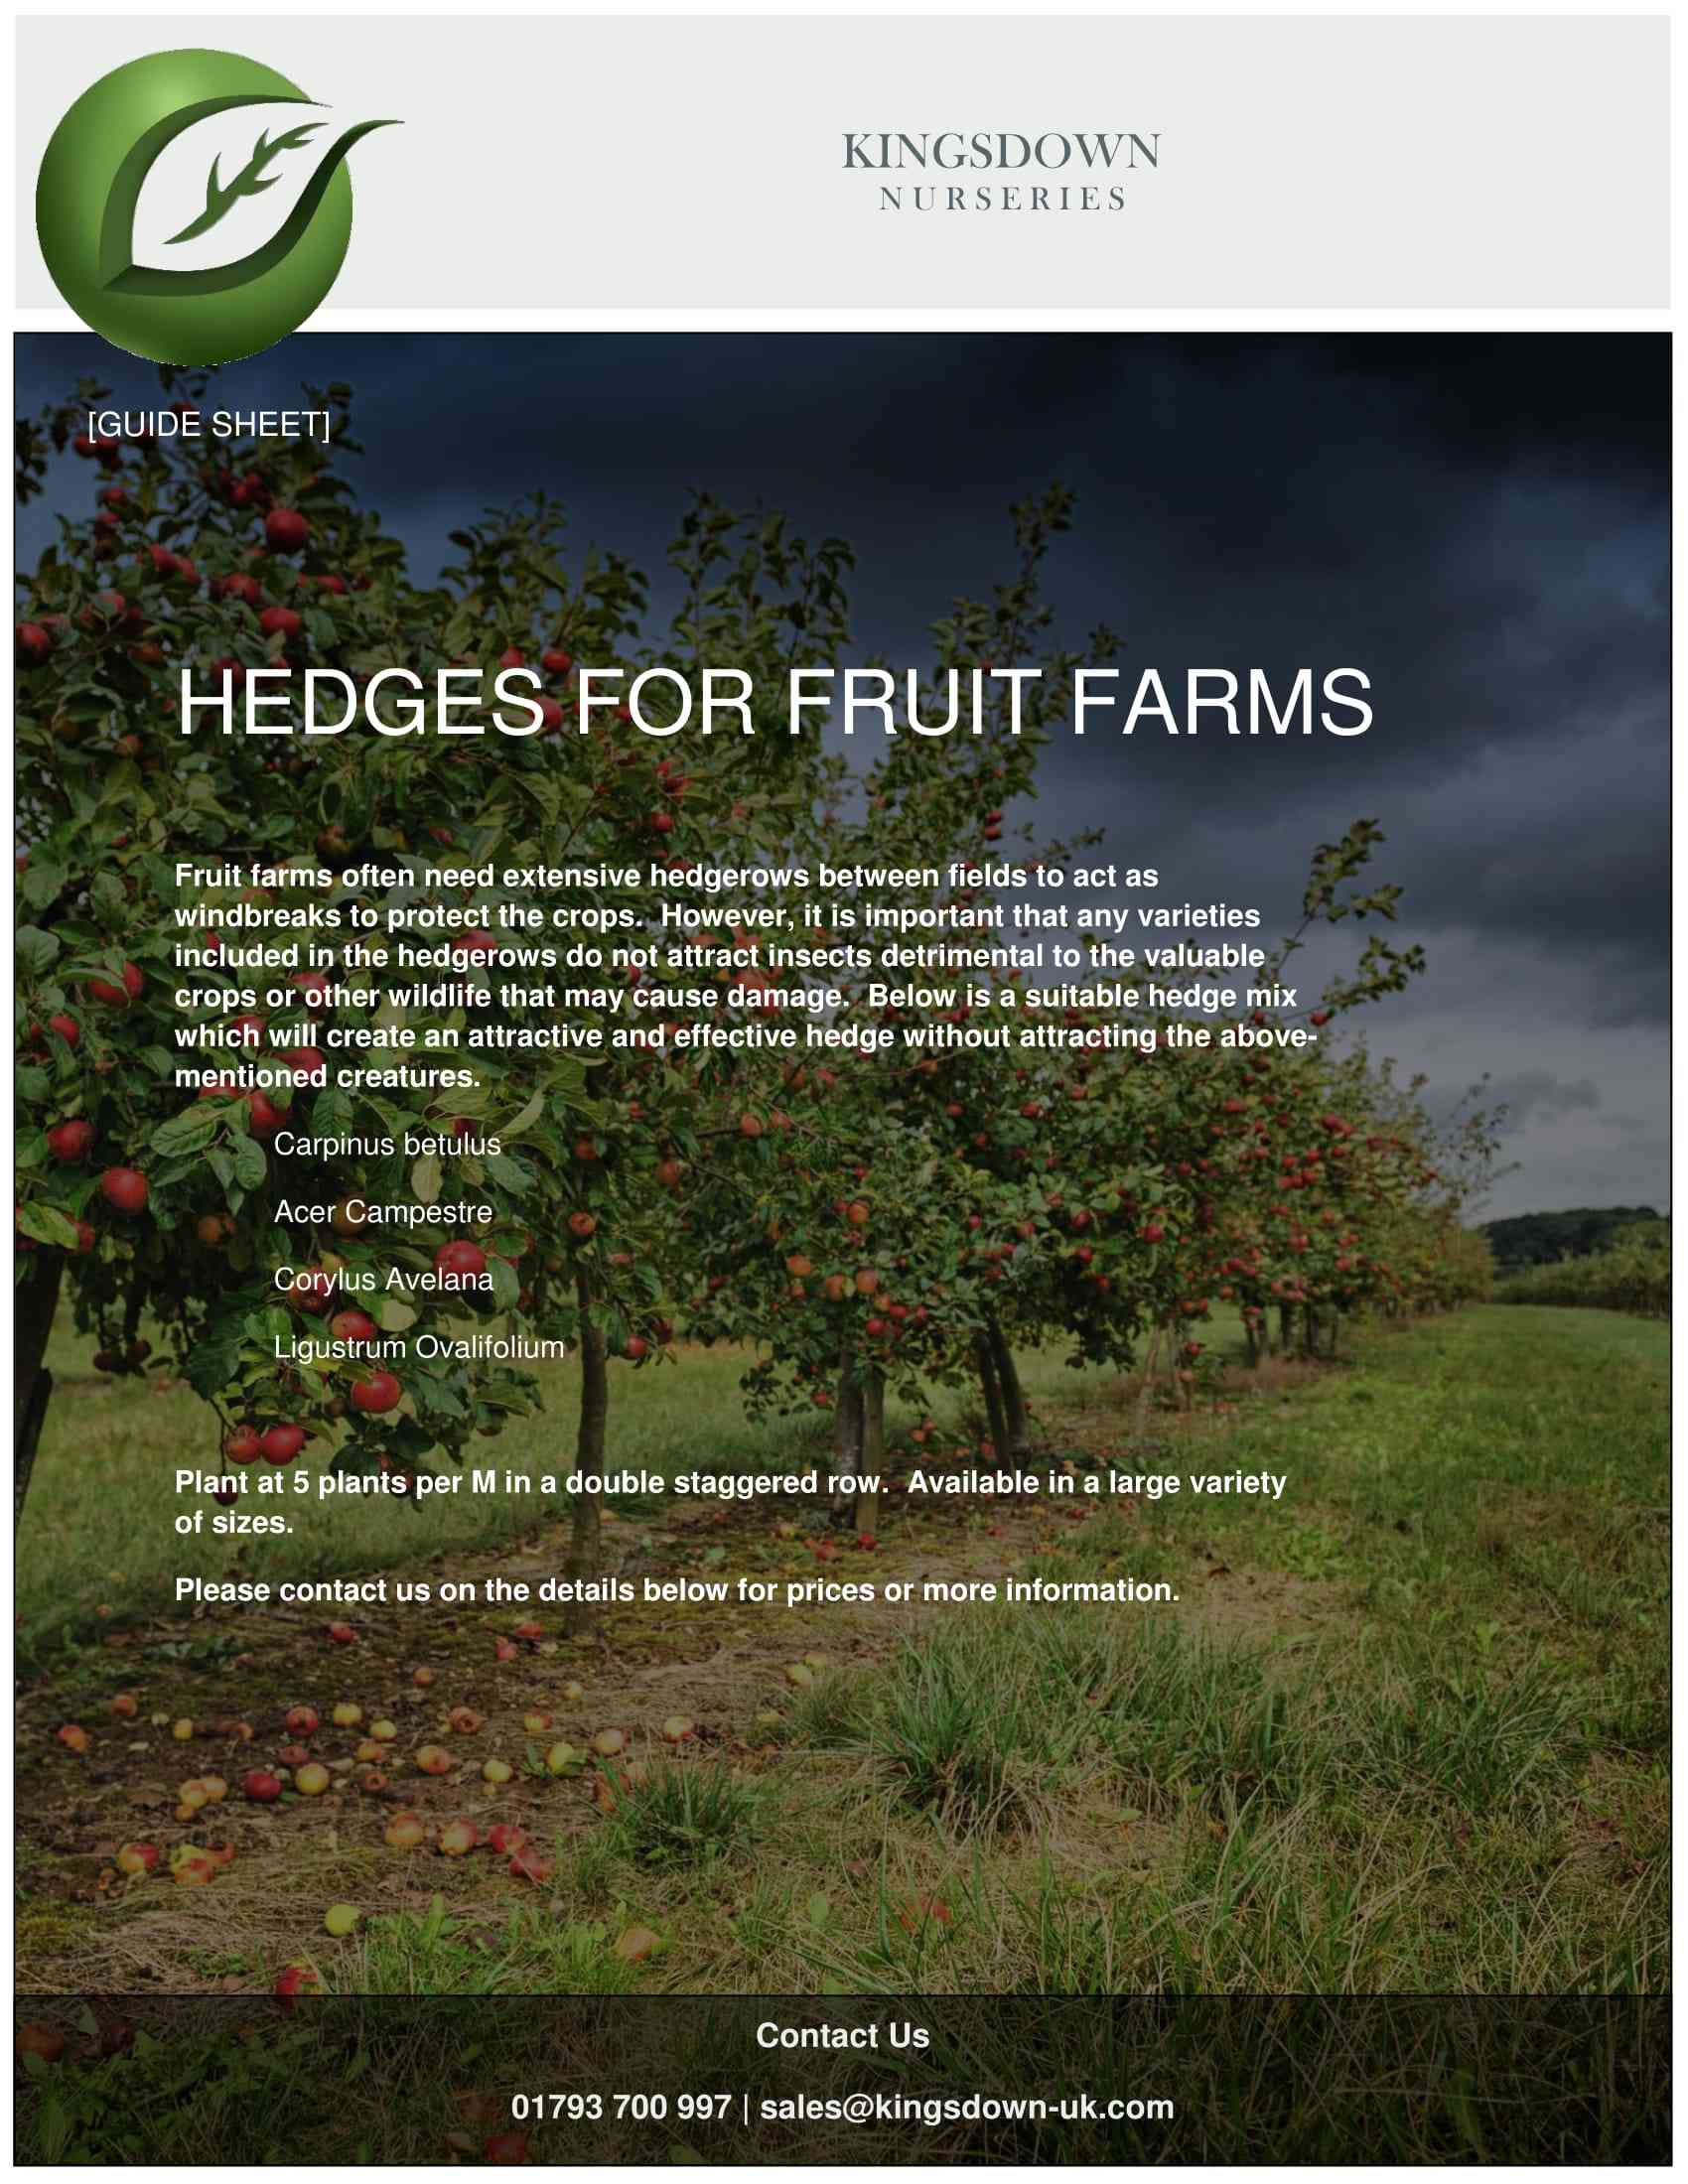 Hedges for Fruit Farms